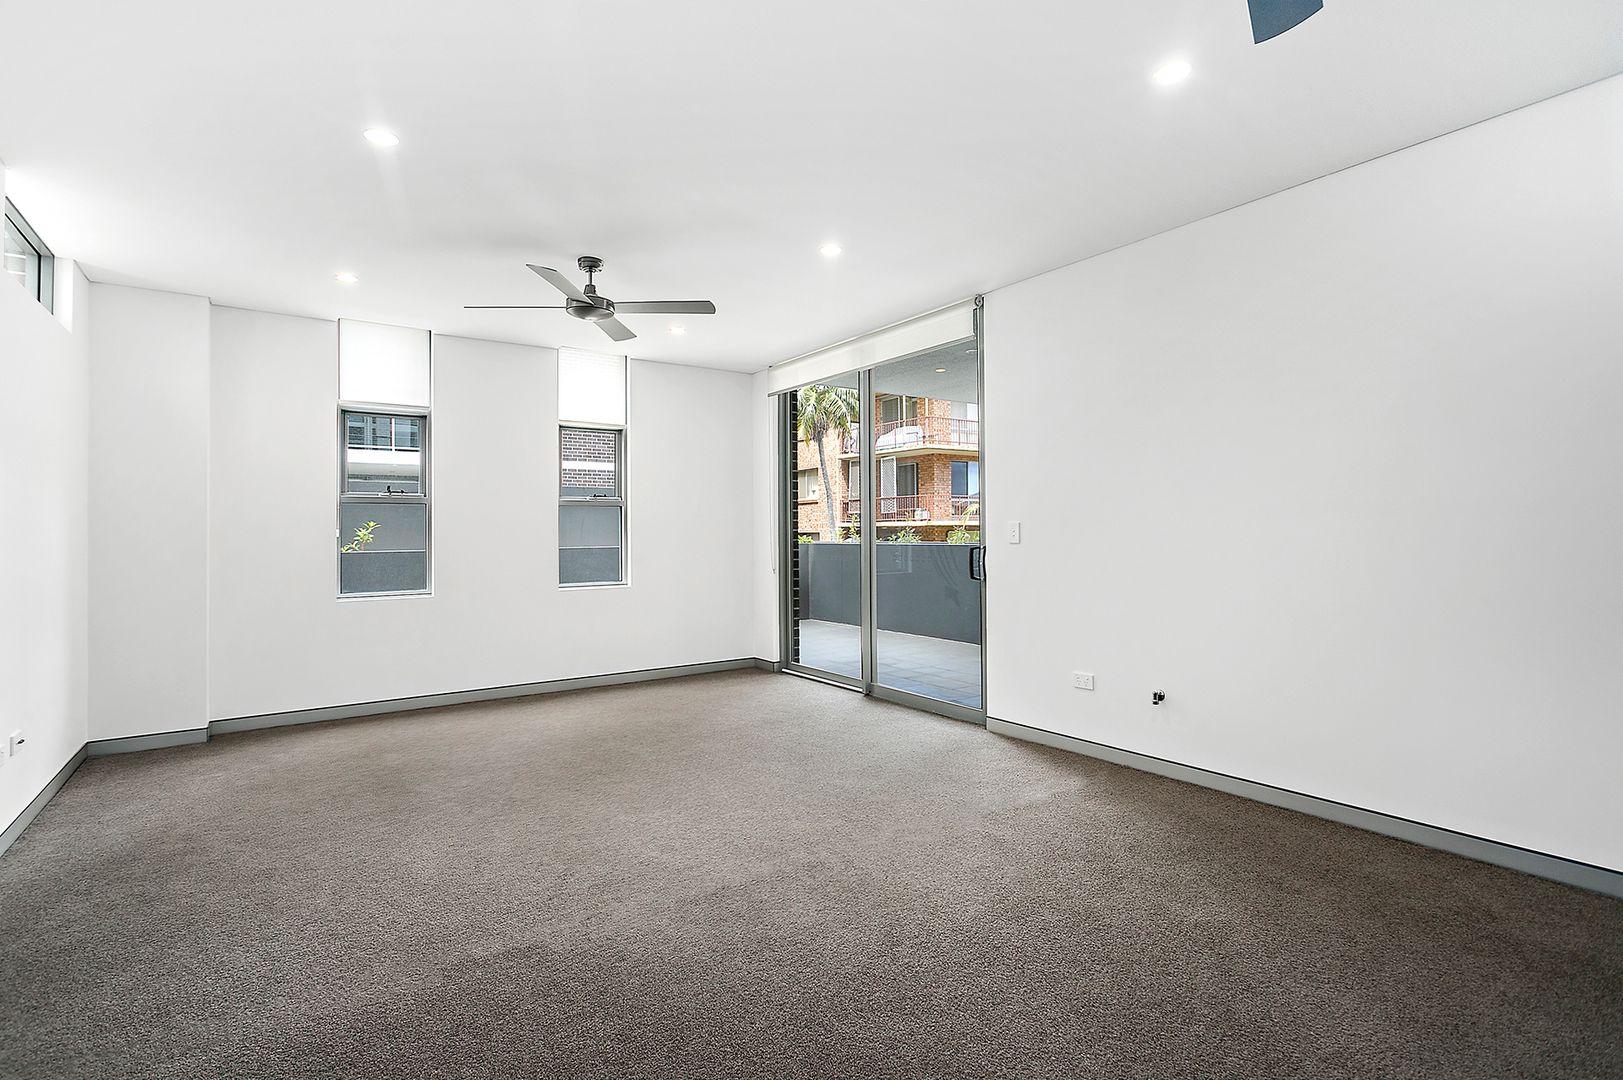 B101/24 Kembla Street, Wollongong NSW 2500, Image 2